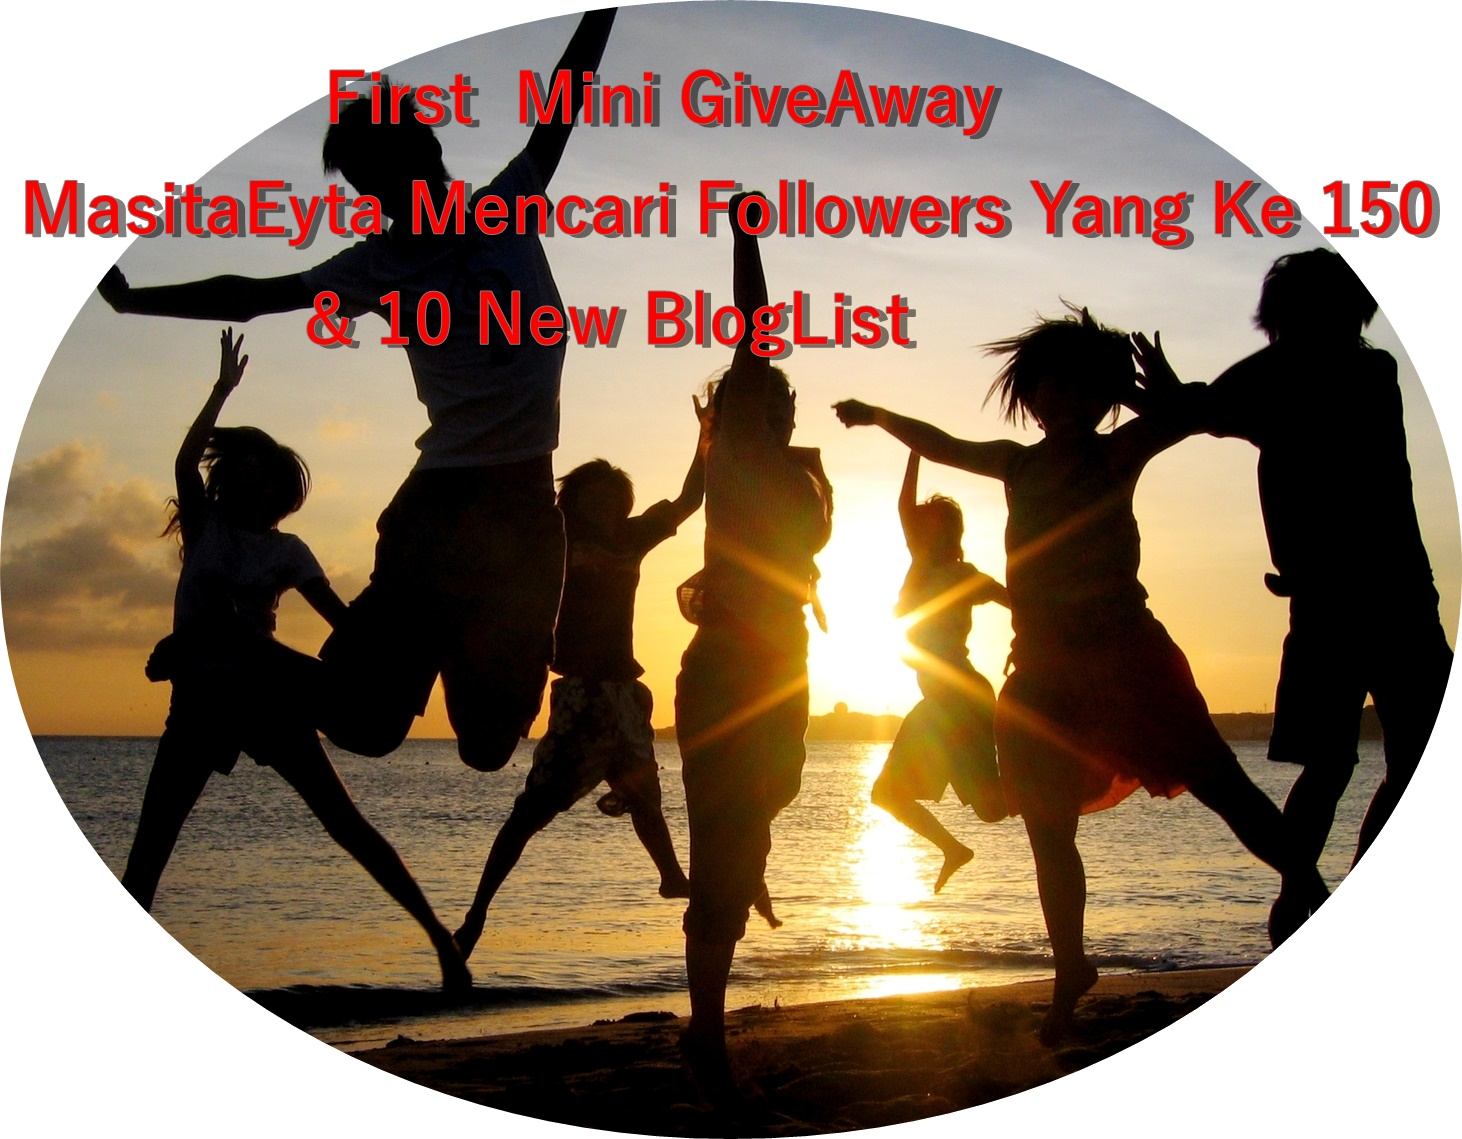 First Mini GiveAway MasitaEyta Mencari Followers Yang ke 150 & 10 New Bloglist